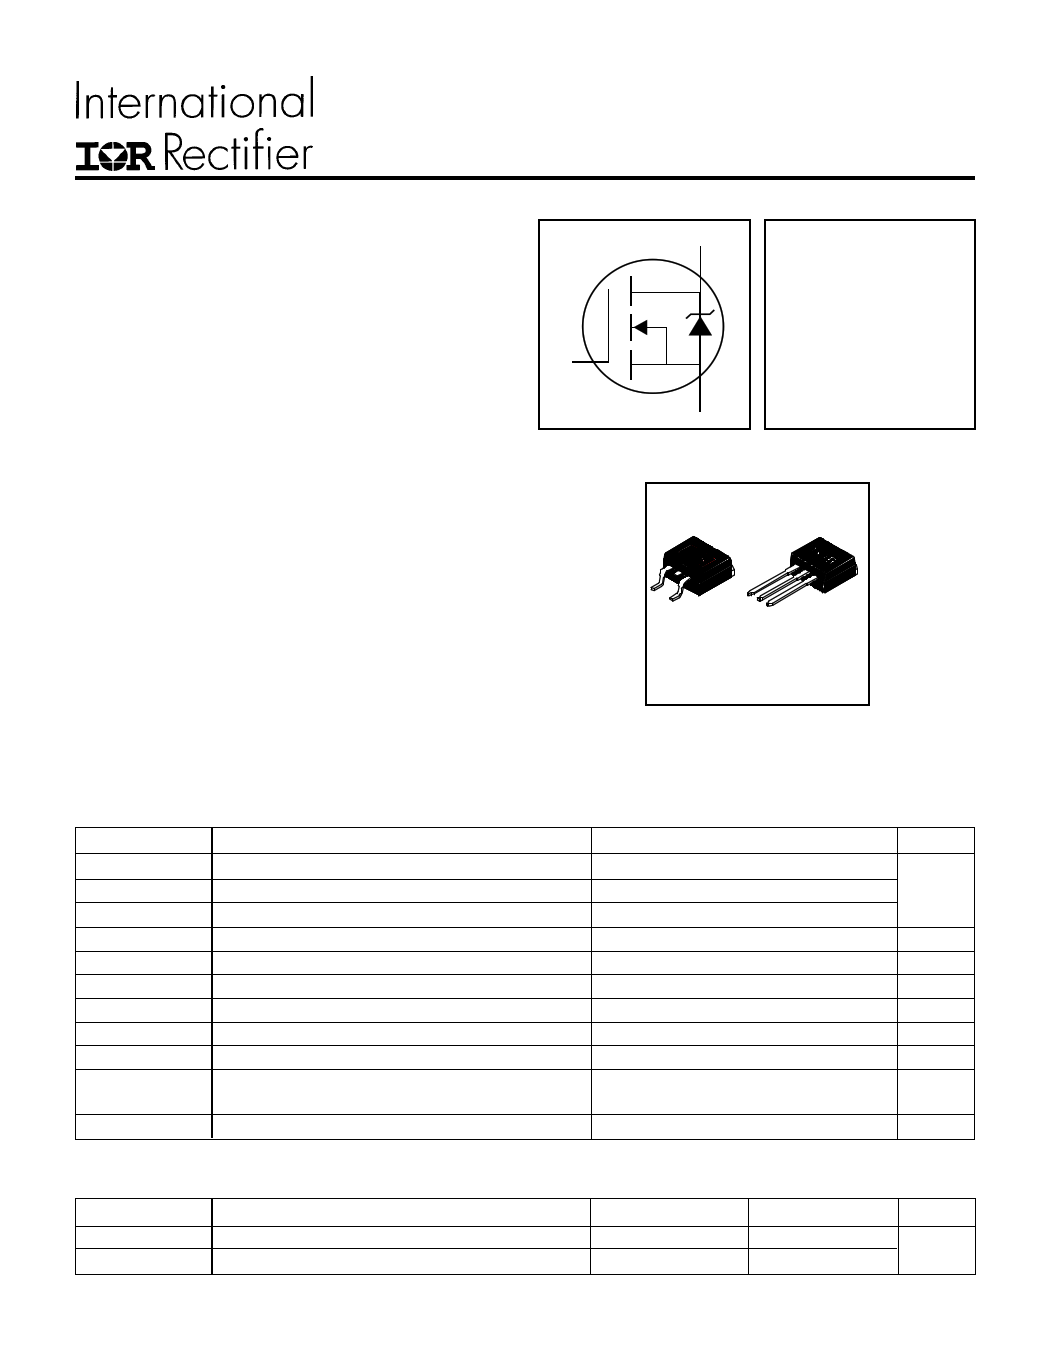 IRFZ46S Datasheet, IRFZ46S PDF,ピン配置, 機能